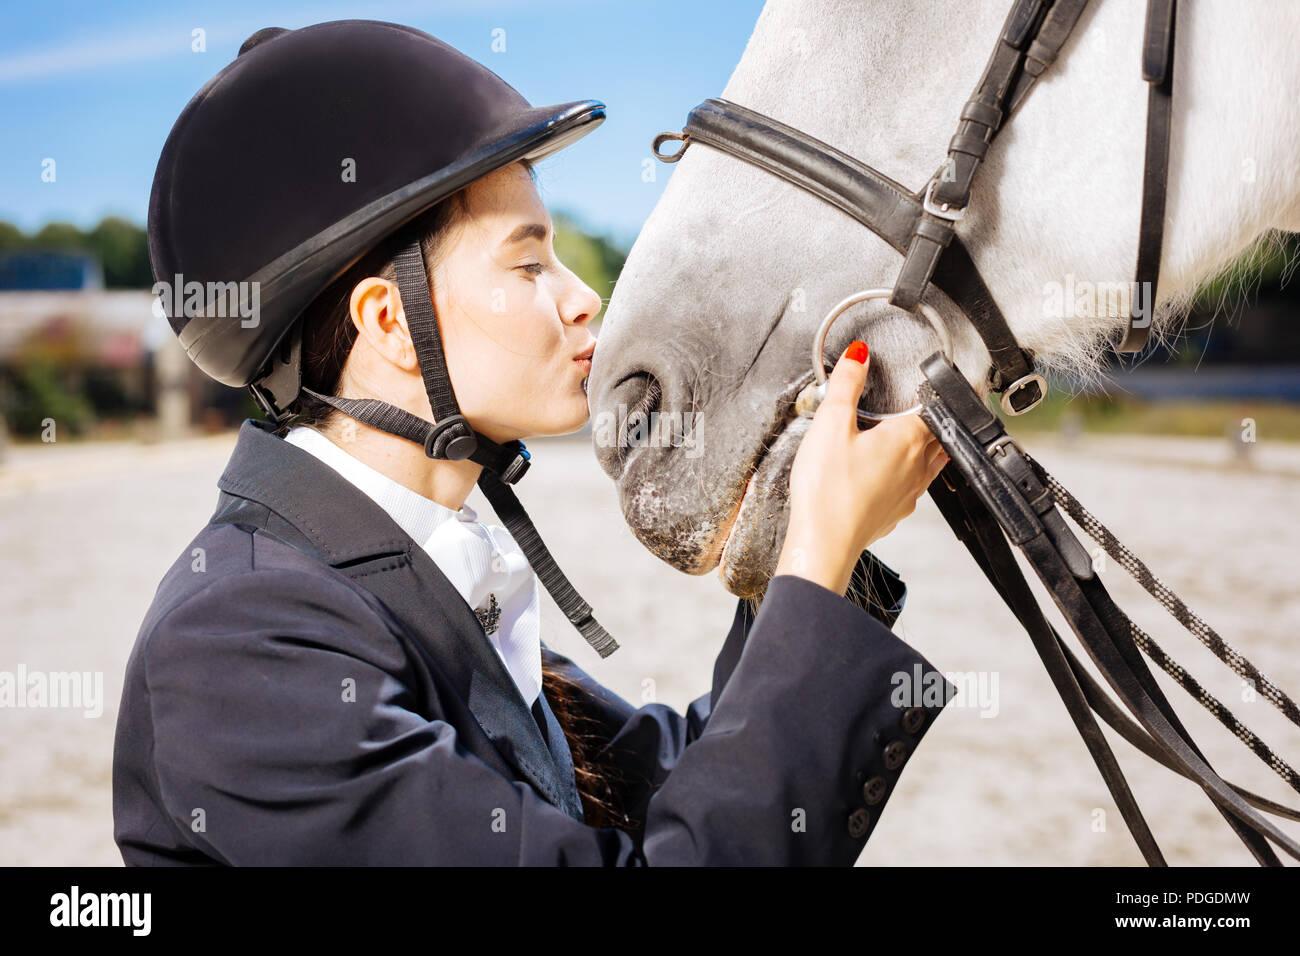 Amazona amorosa con rojo nail art besando a su caballo blanco Imagen De Stock